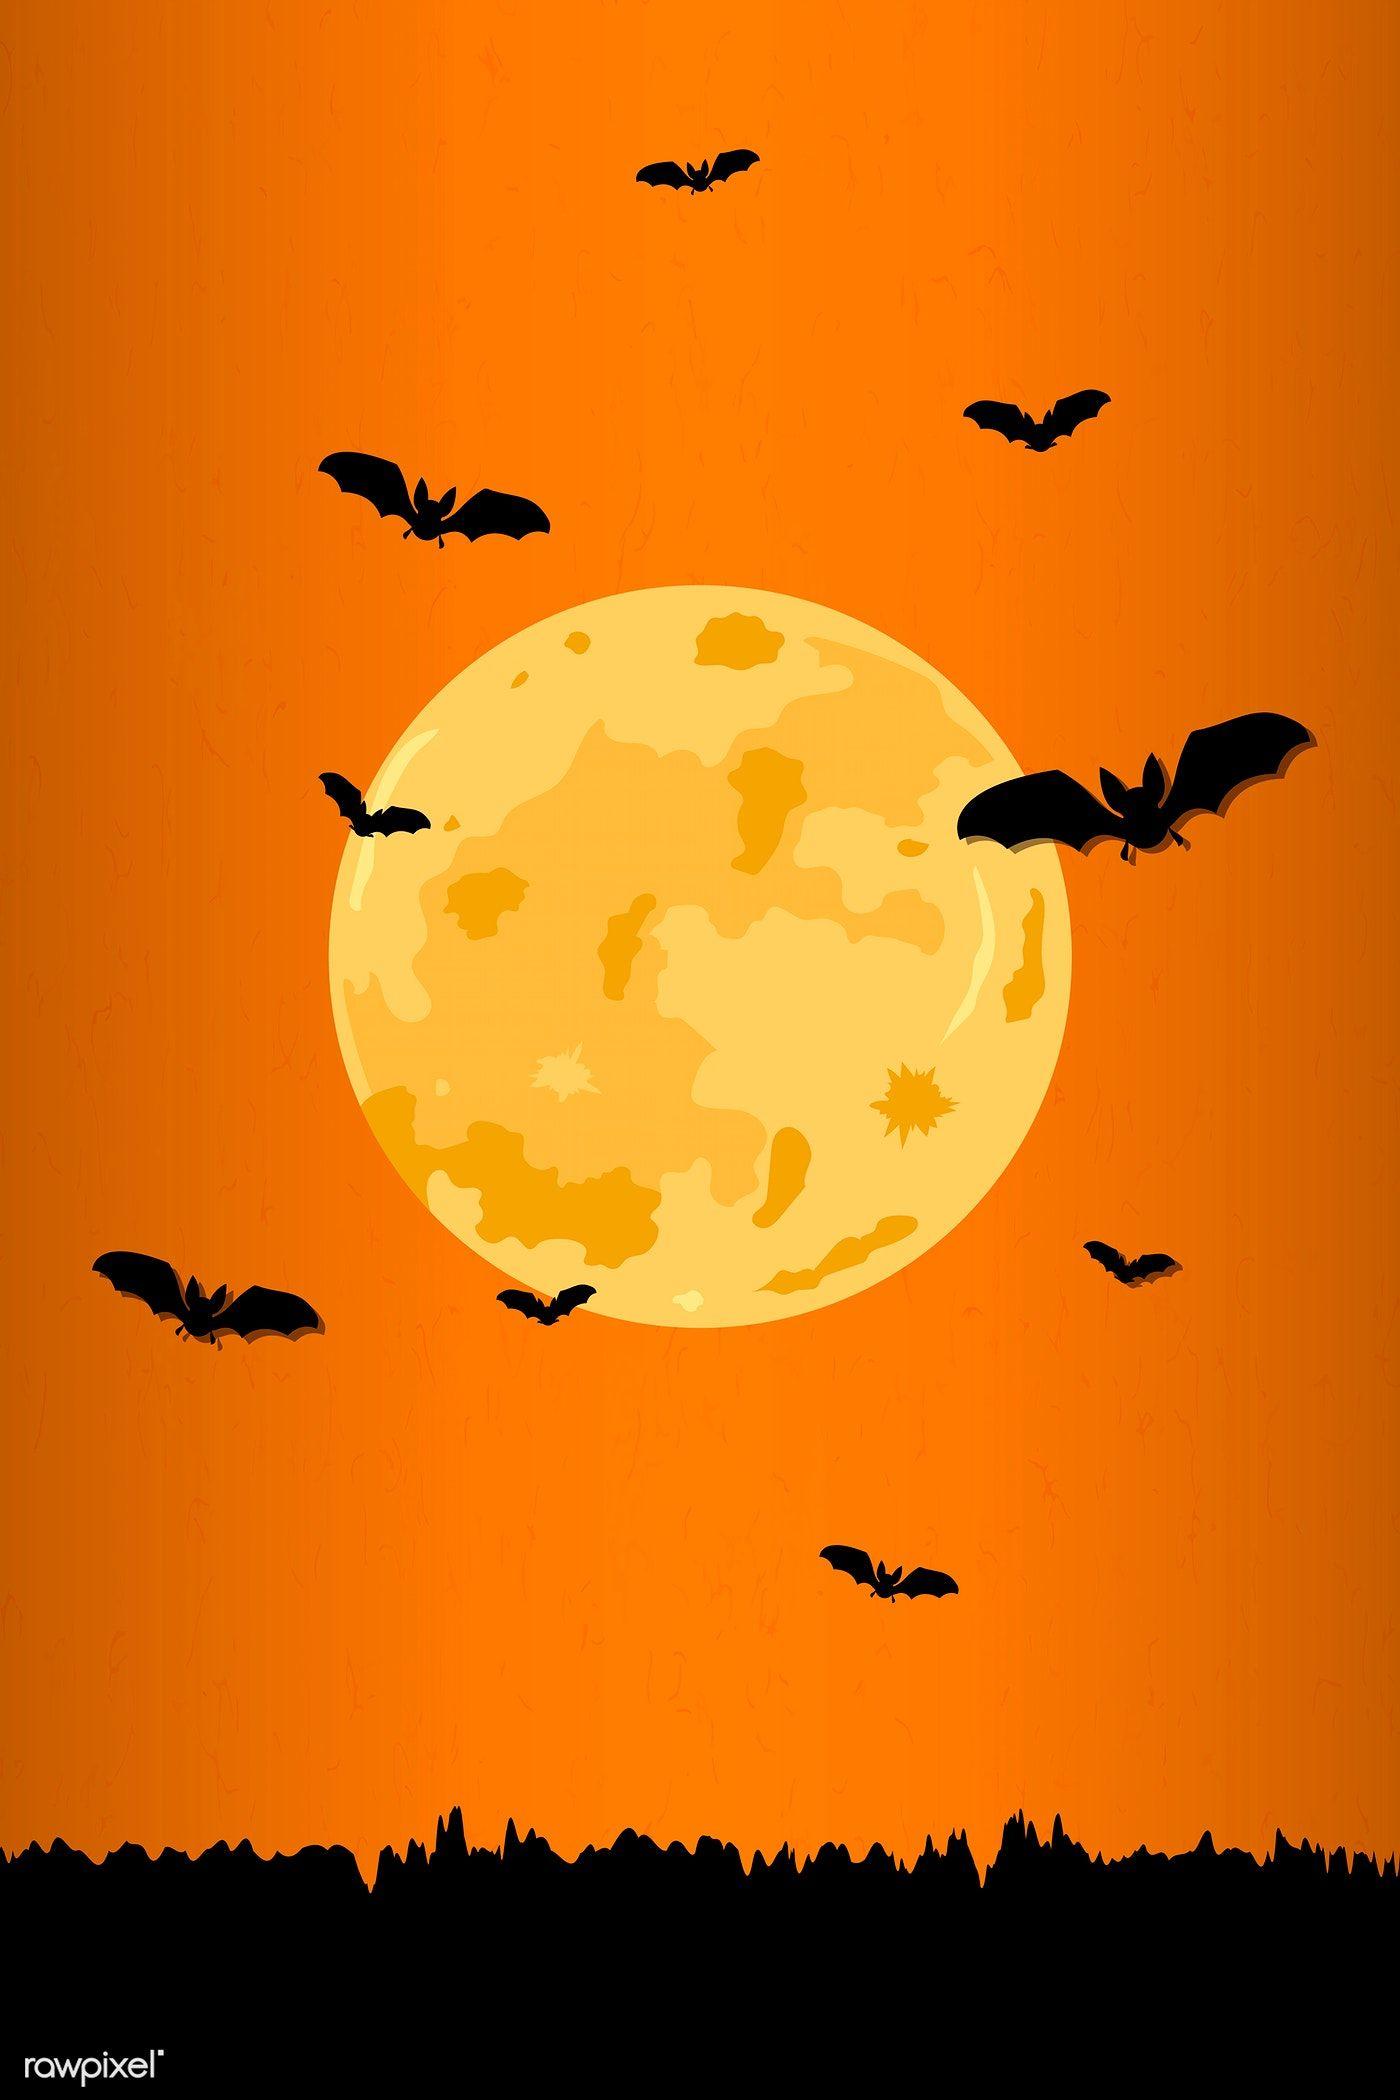 Full Moon Pattern On Orange Halloween Background Vector Free Image By Rawpixel Com Aew Halloween Illustration Halloween Backgrounds Moon Pattern